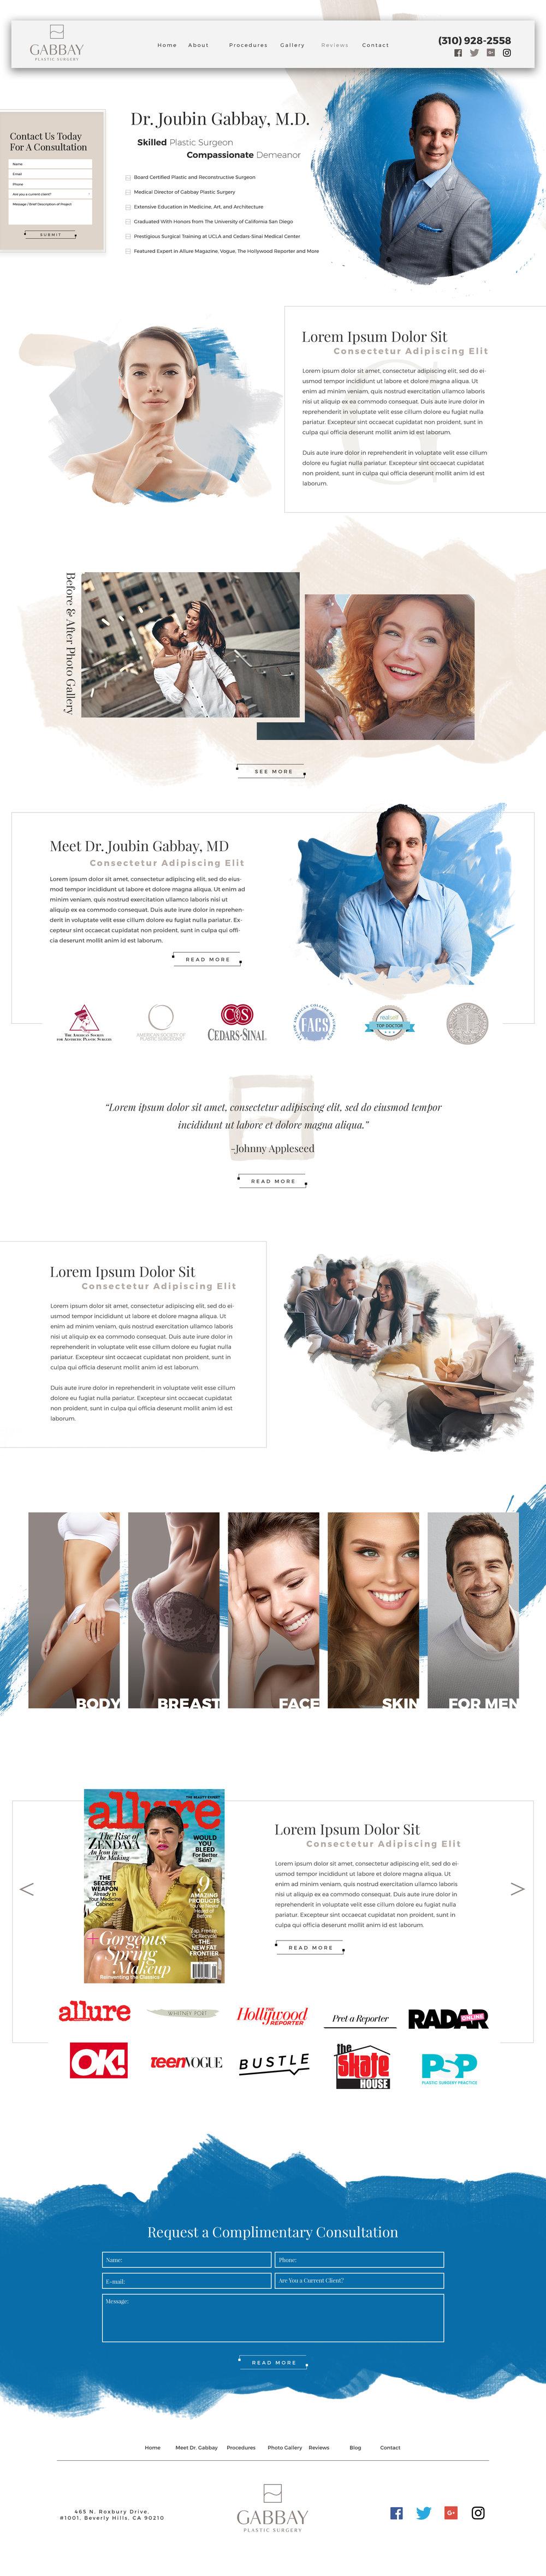 Web Design: Dr. Gabbay- Plastic Surgery Website